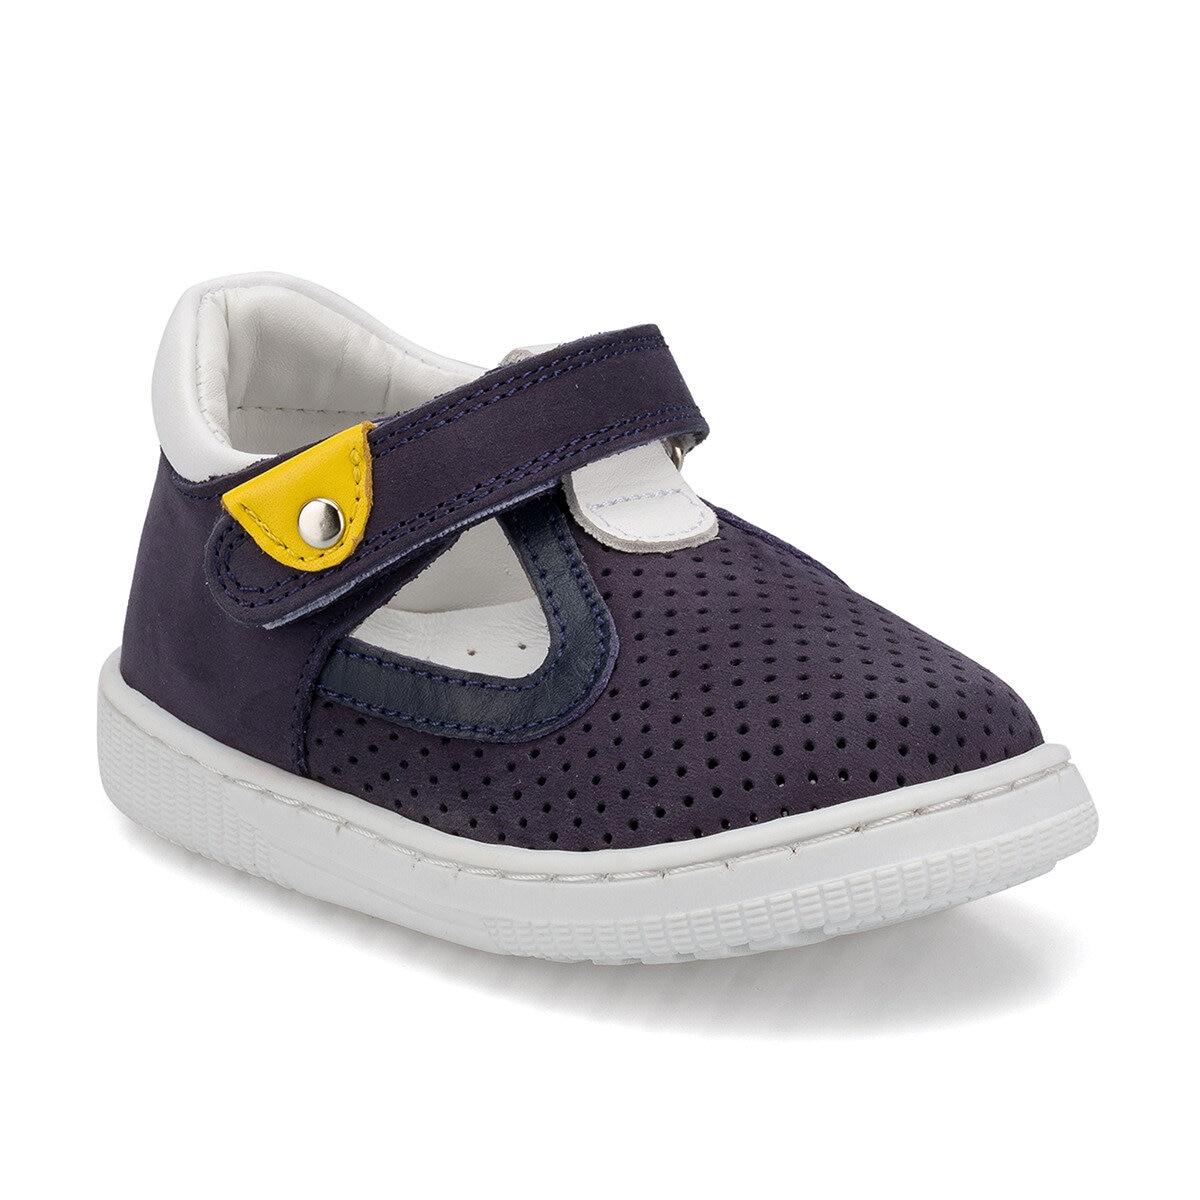 FLO 512529.I Navy Blue Male Child Sneaker Shoes Polaris